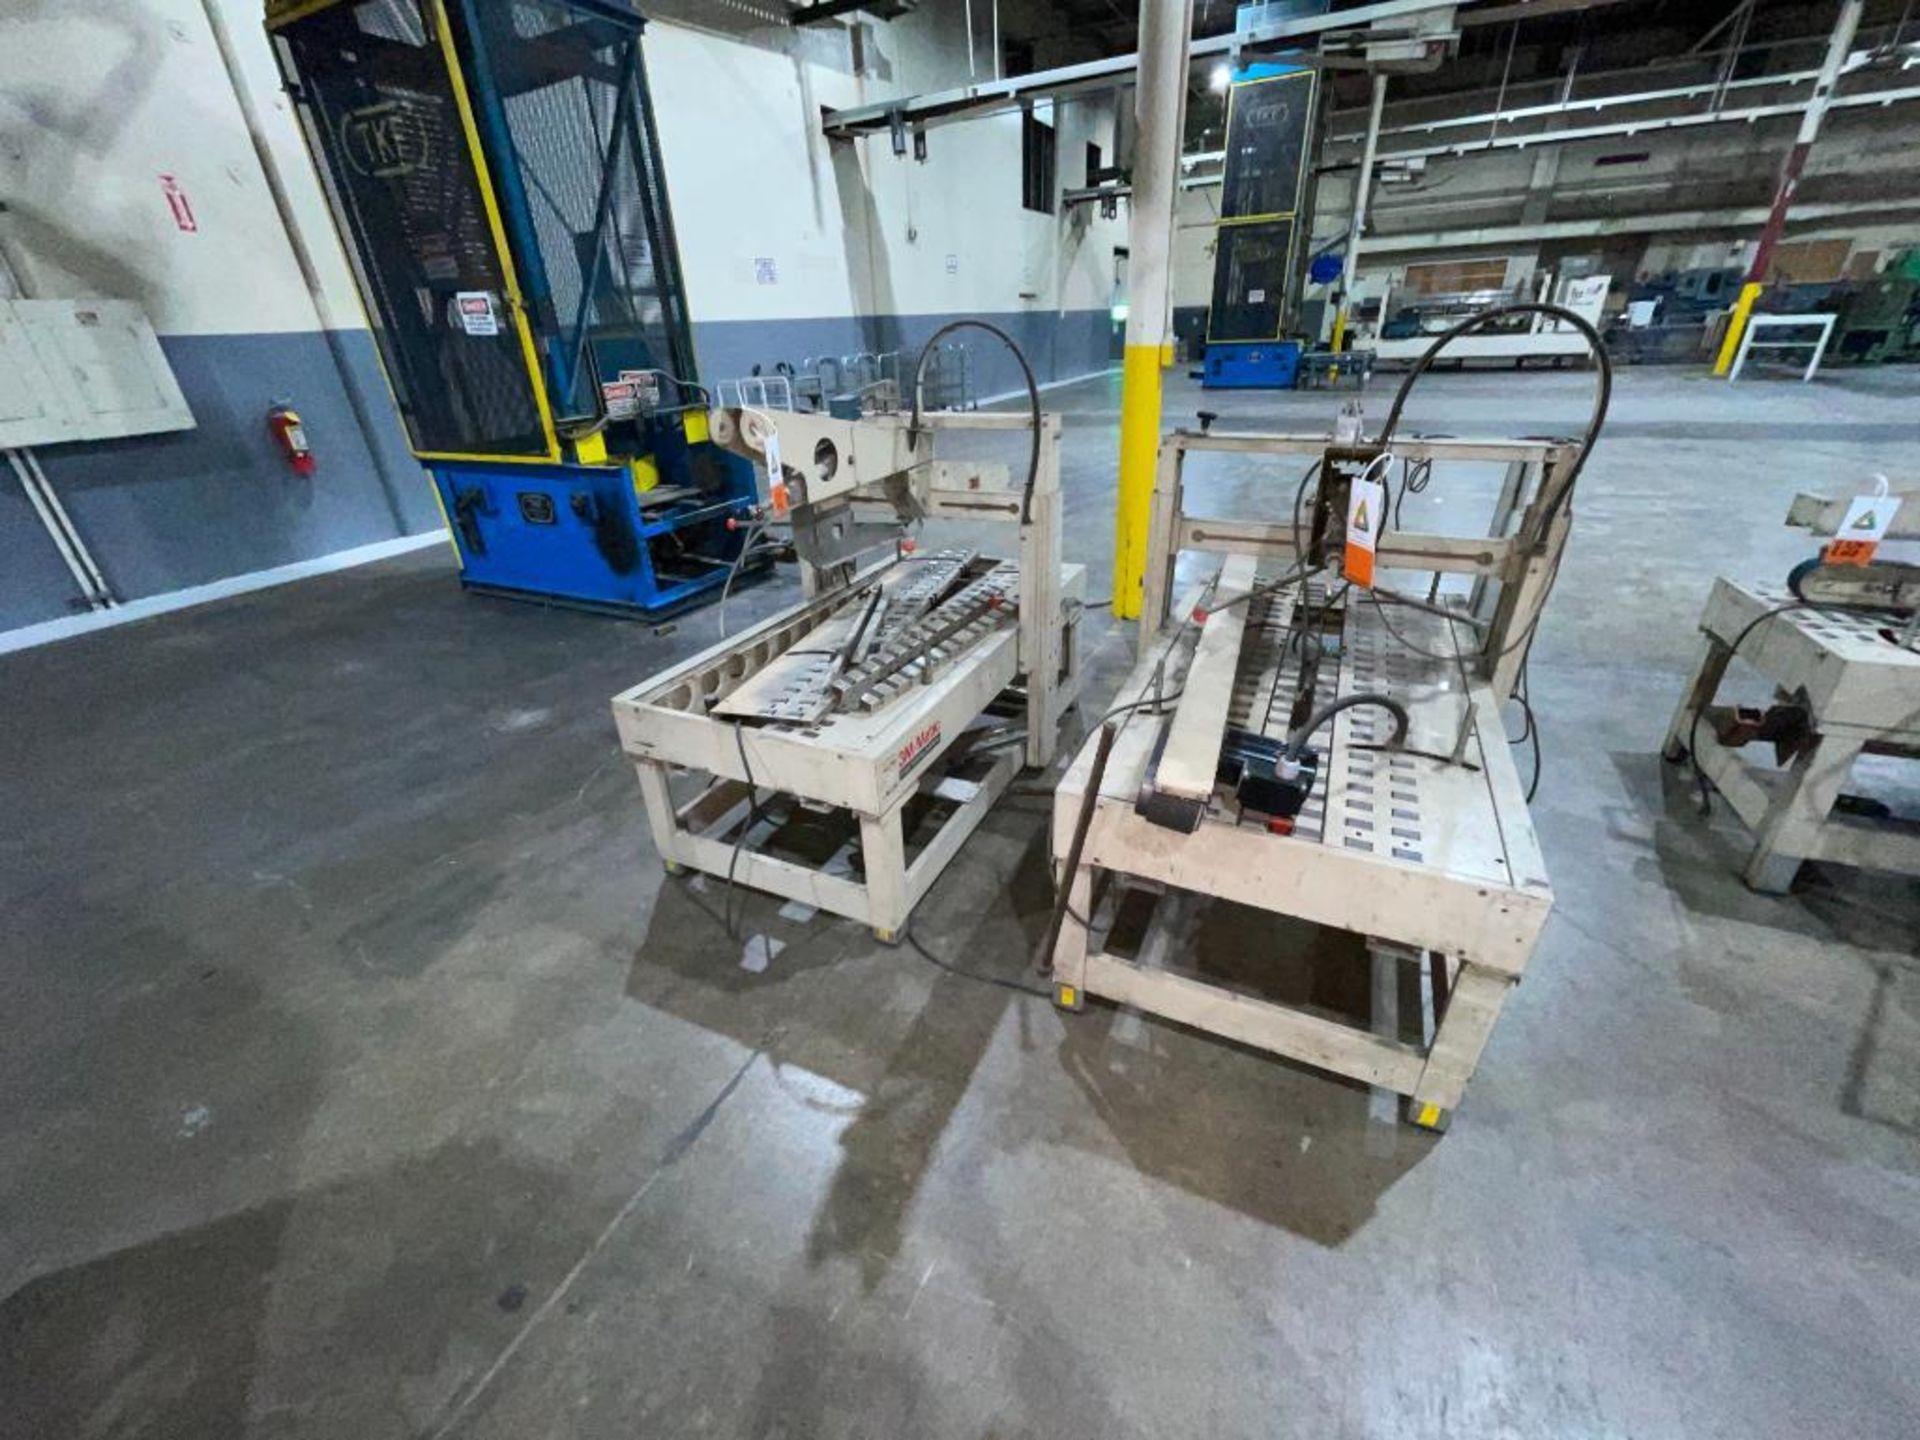 (3) 3M-Matic case taper parts